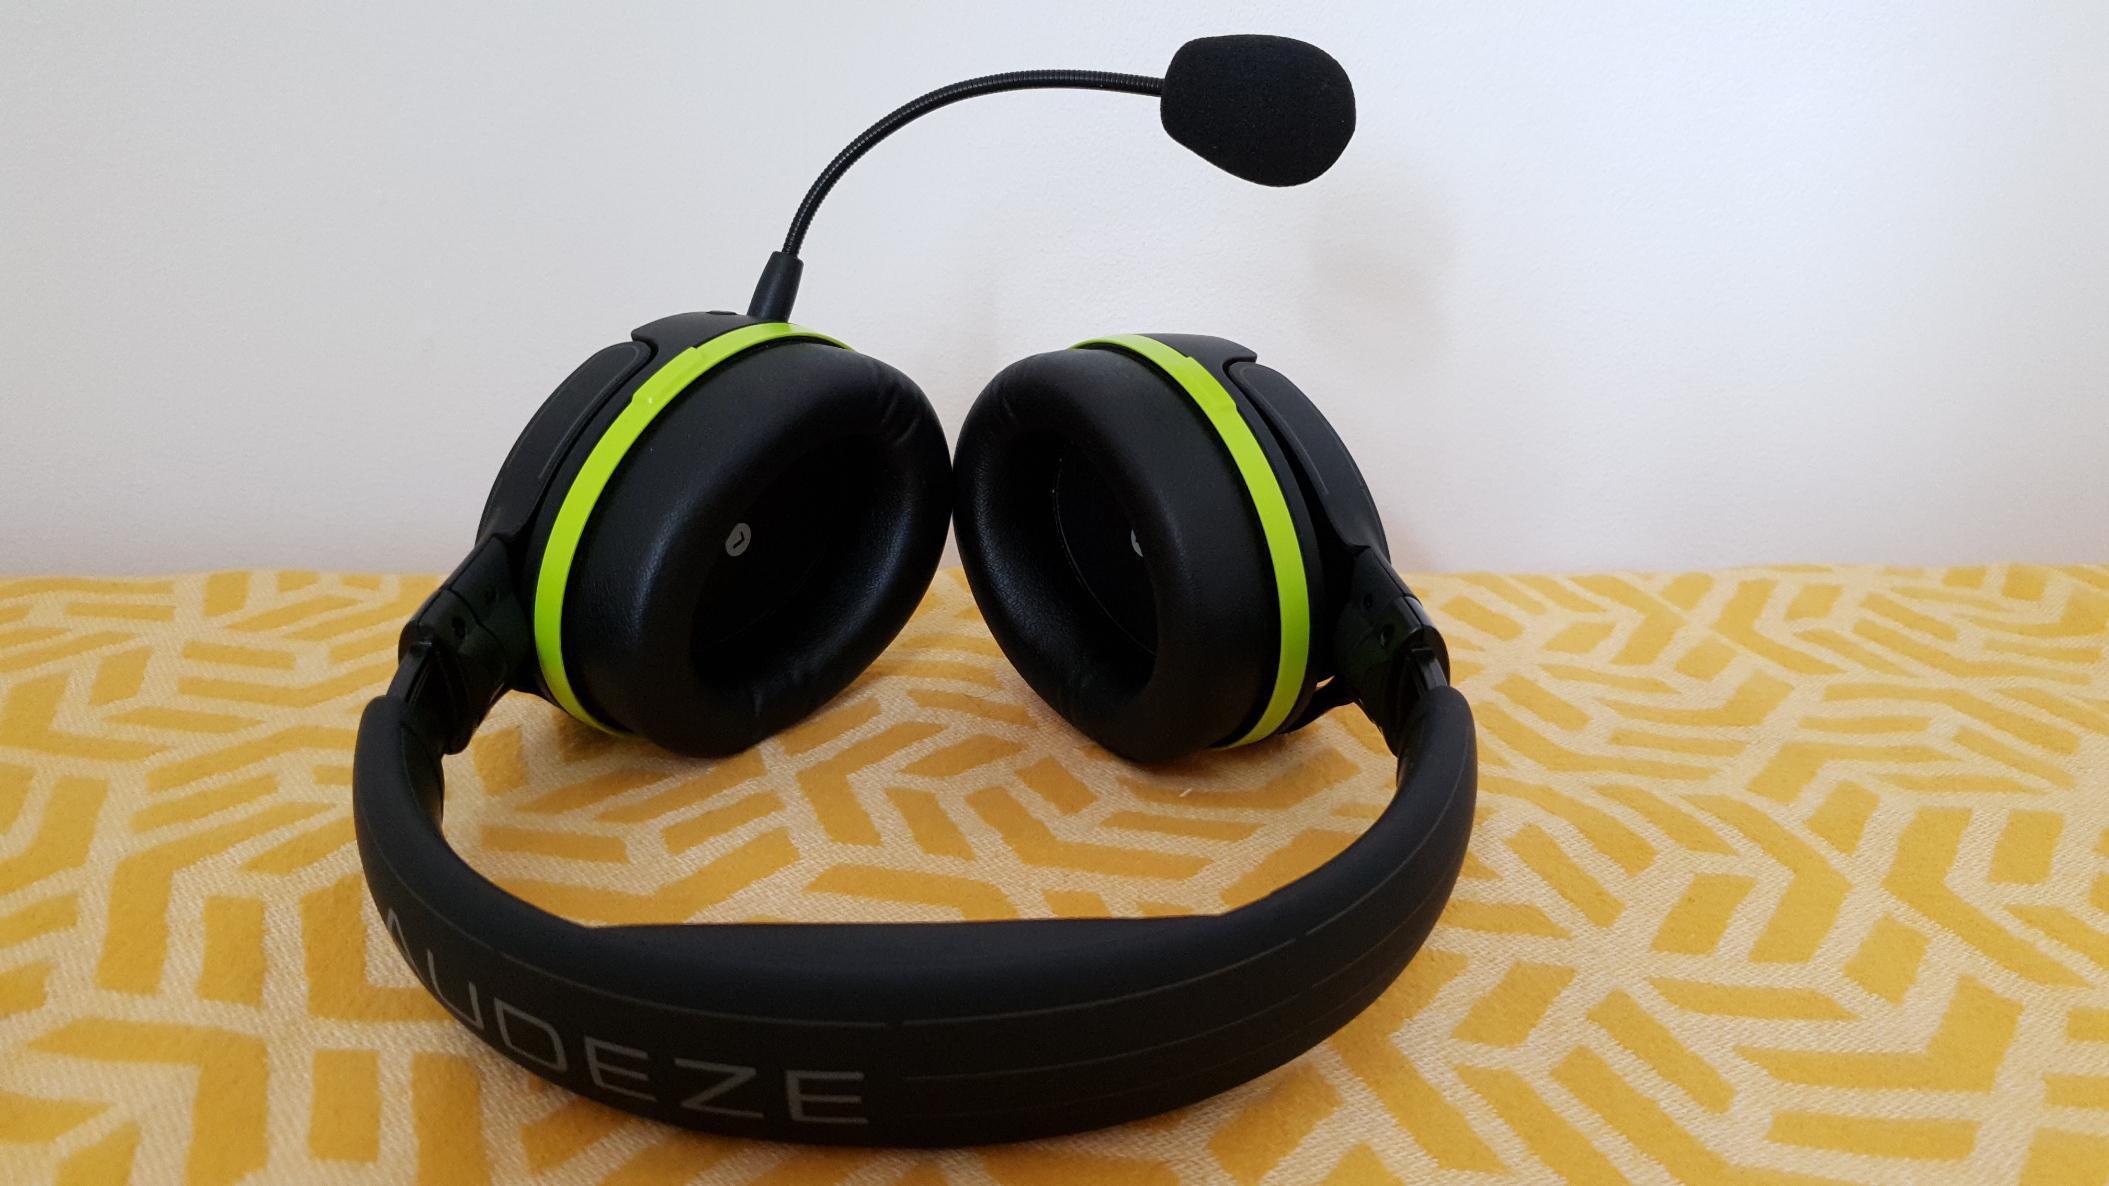 Audeze Penrose X earcups